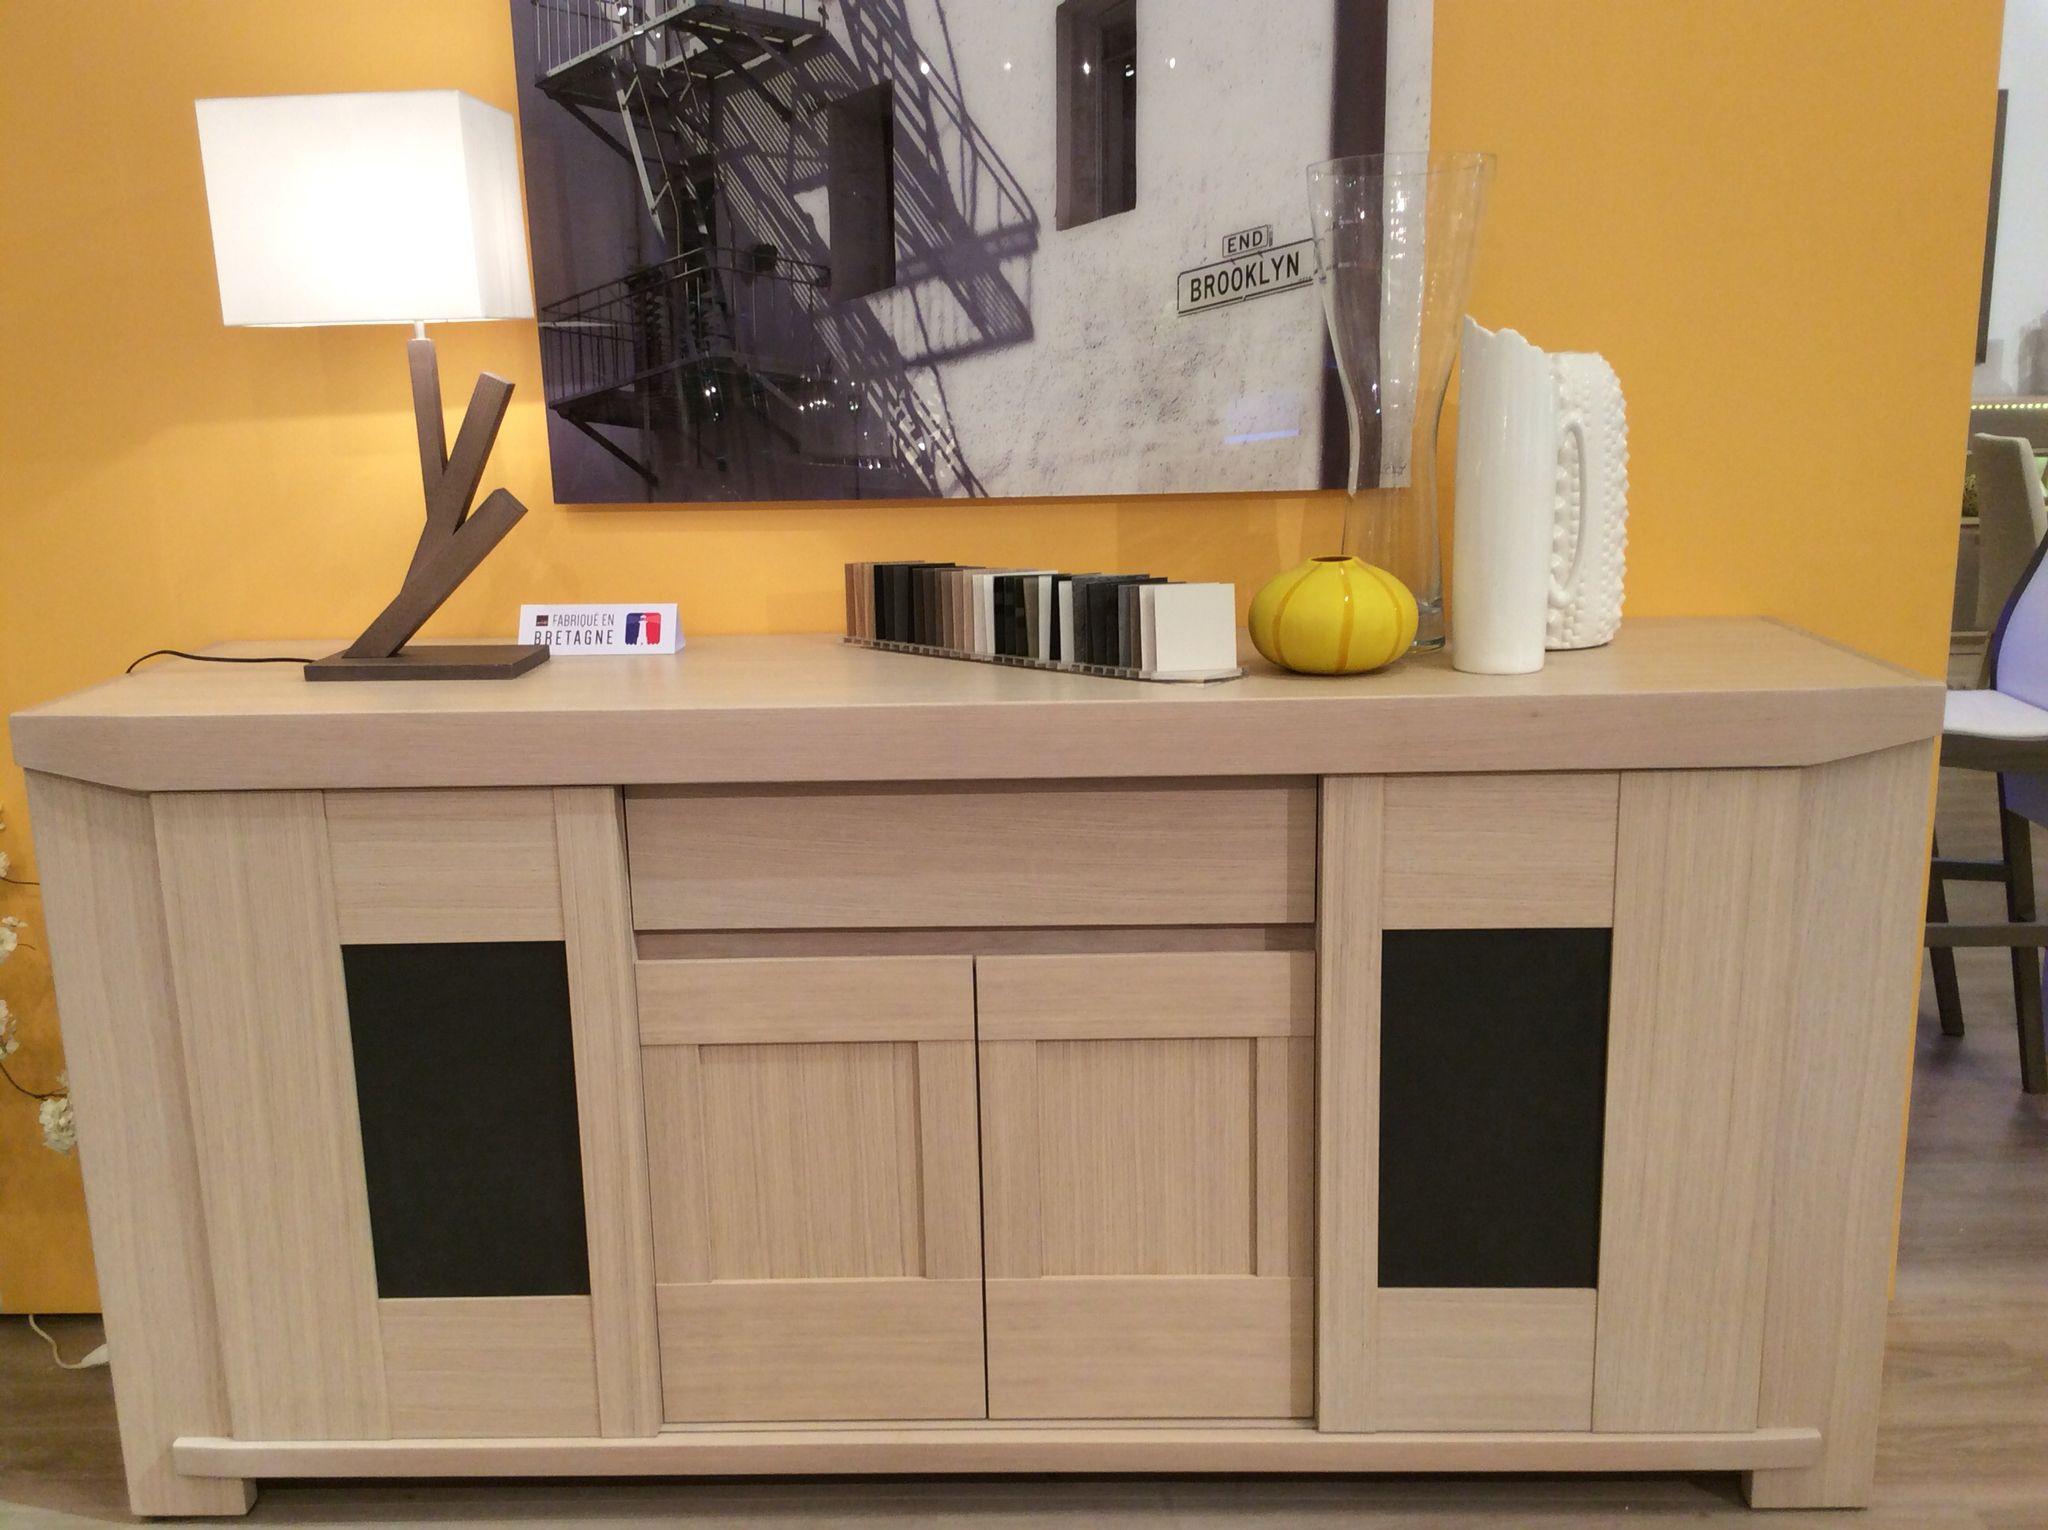 Colorado Tradition Meubles Ernest Menard Dinan Bretagne Home Decor Furniture Decor